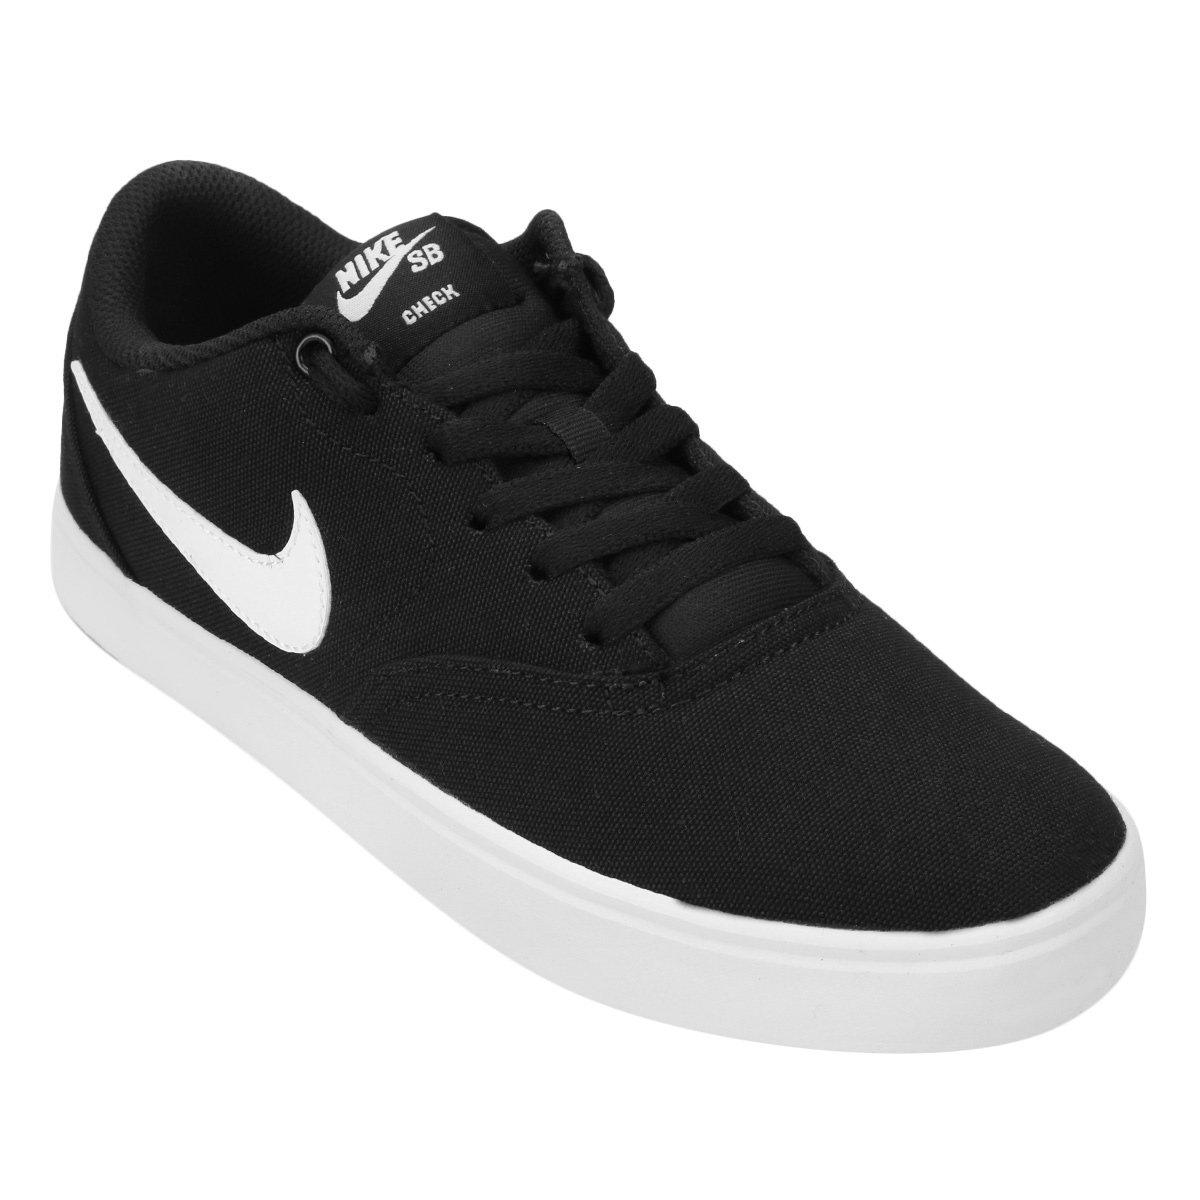 Tênis Nike Wmns Sb Check Solar Cnvs Feminino - Preto e Branco ... 412475bfaffef